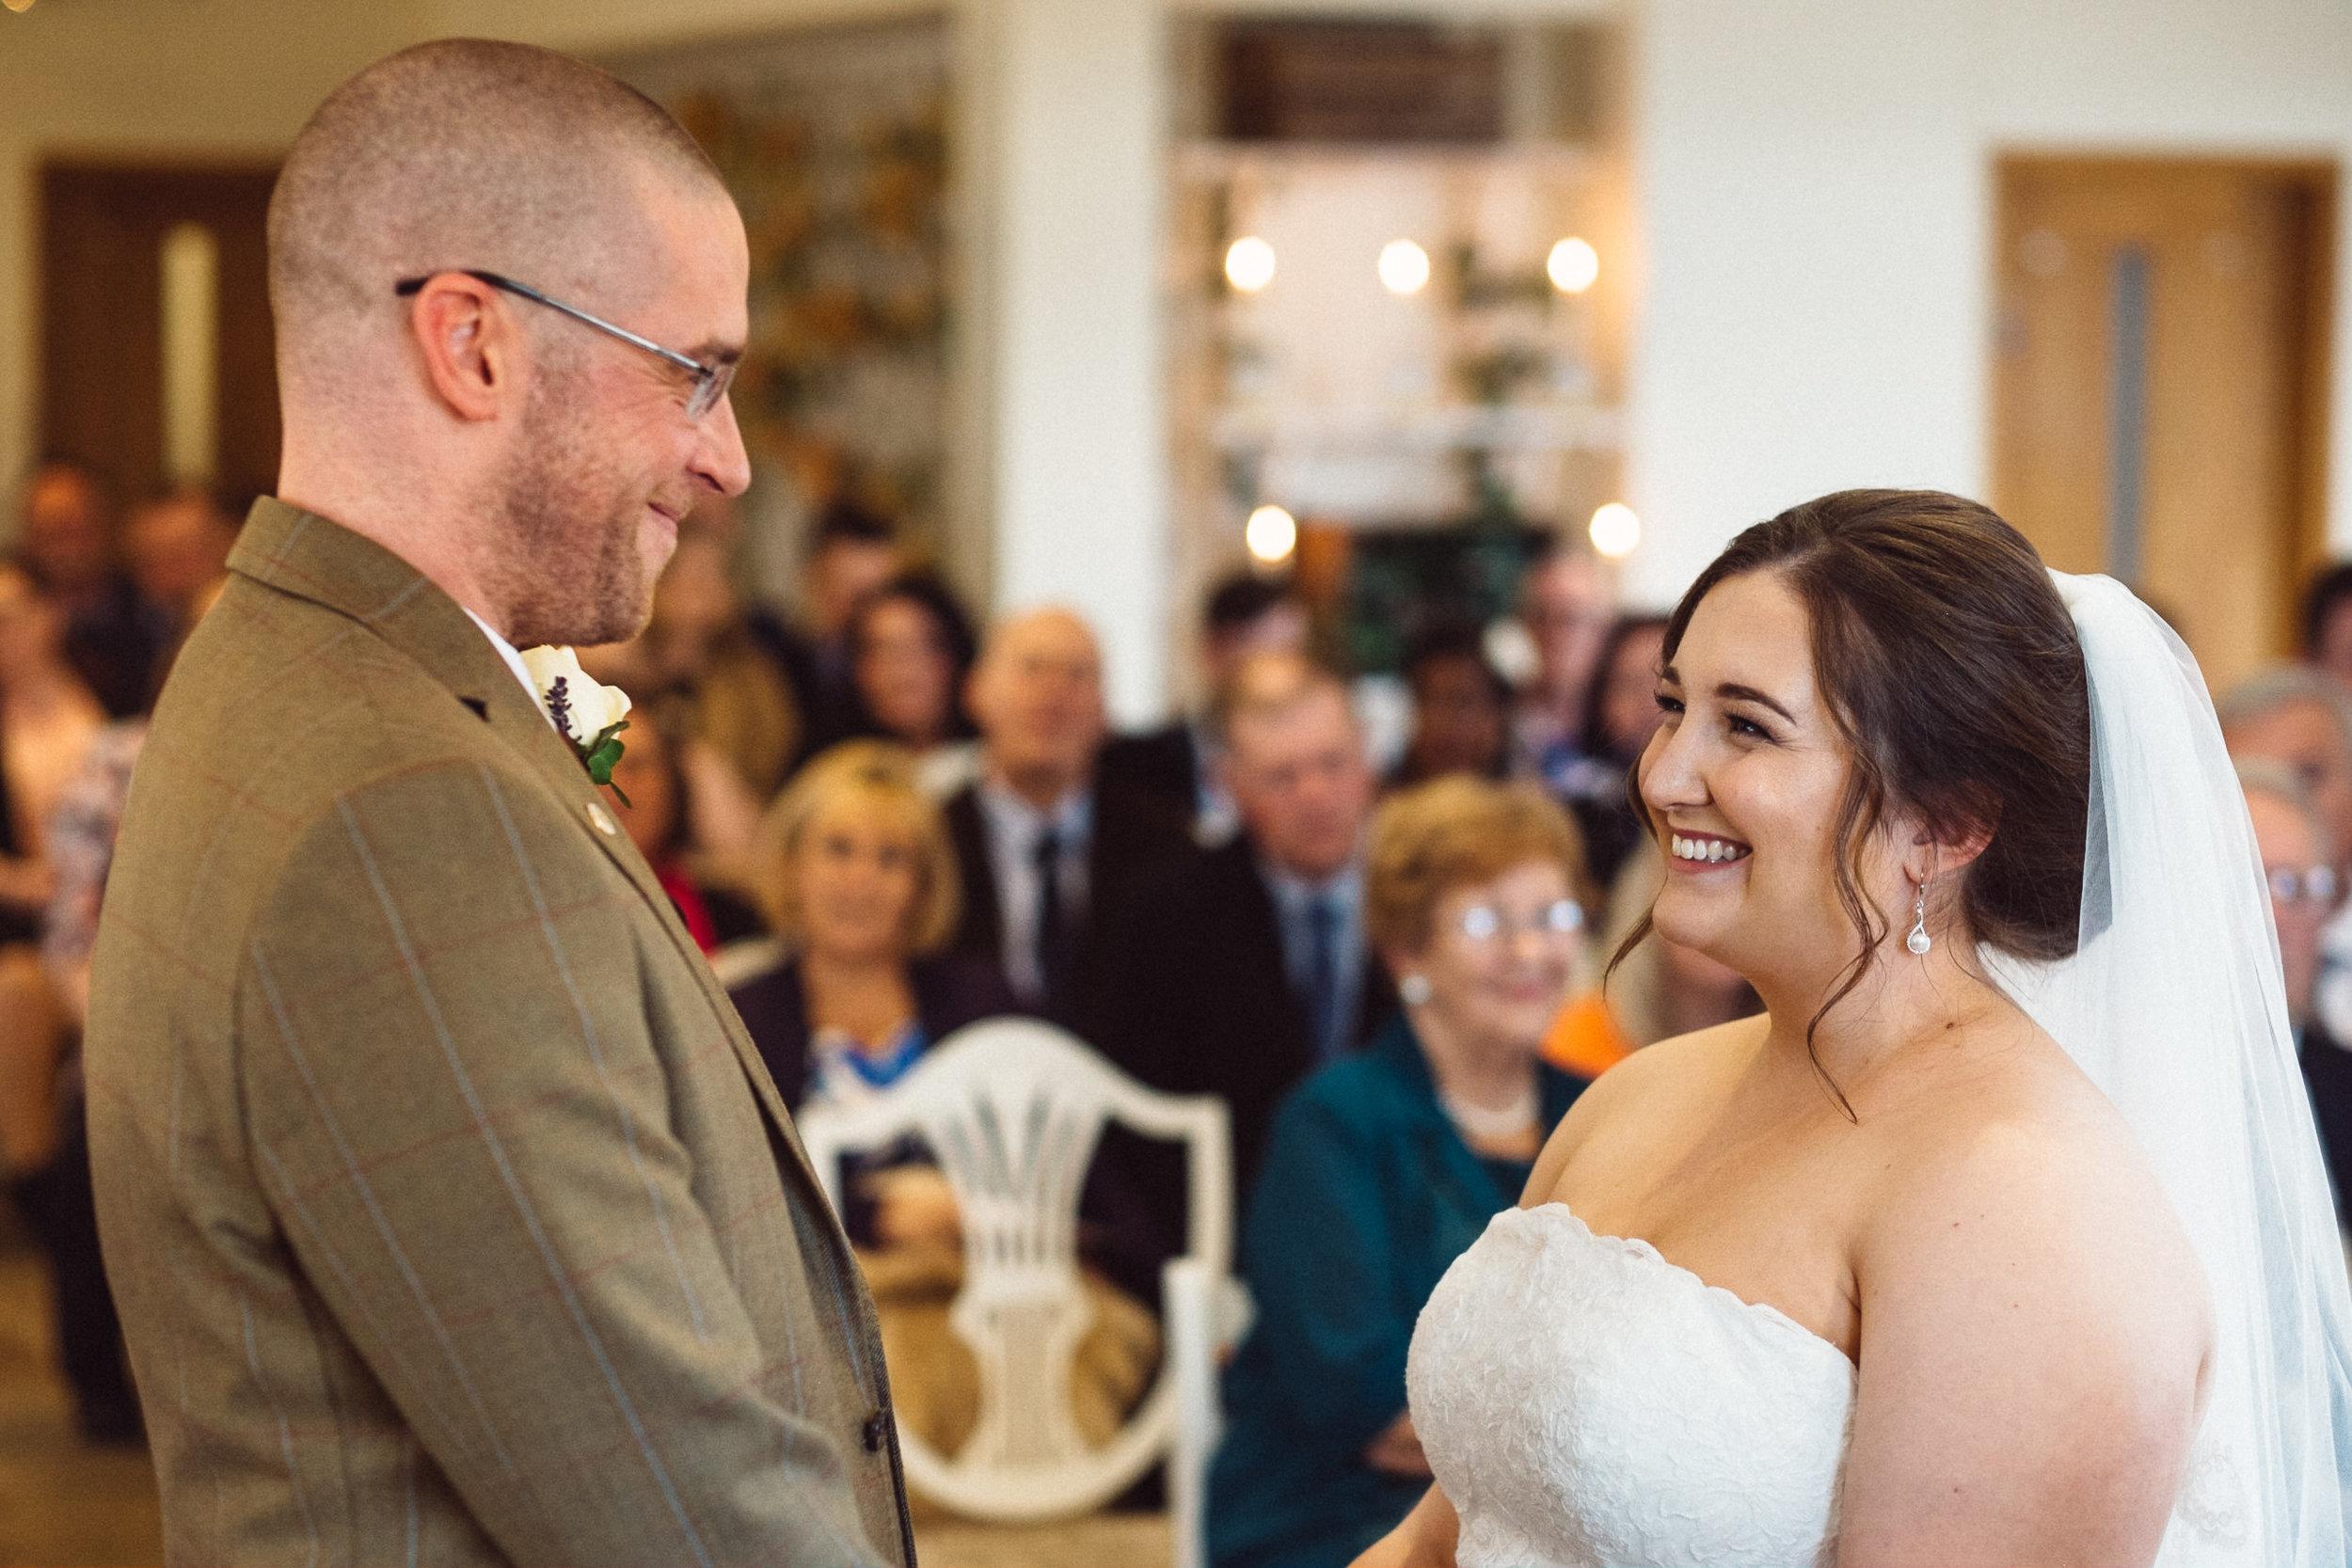 Hereford_wedding_photographer32.jpg